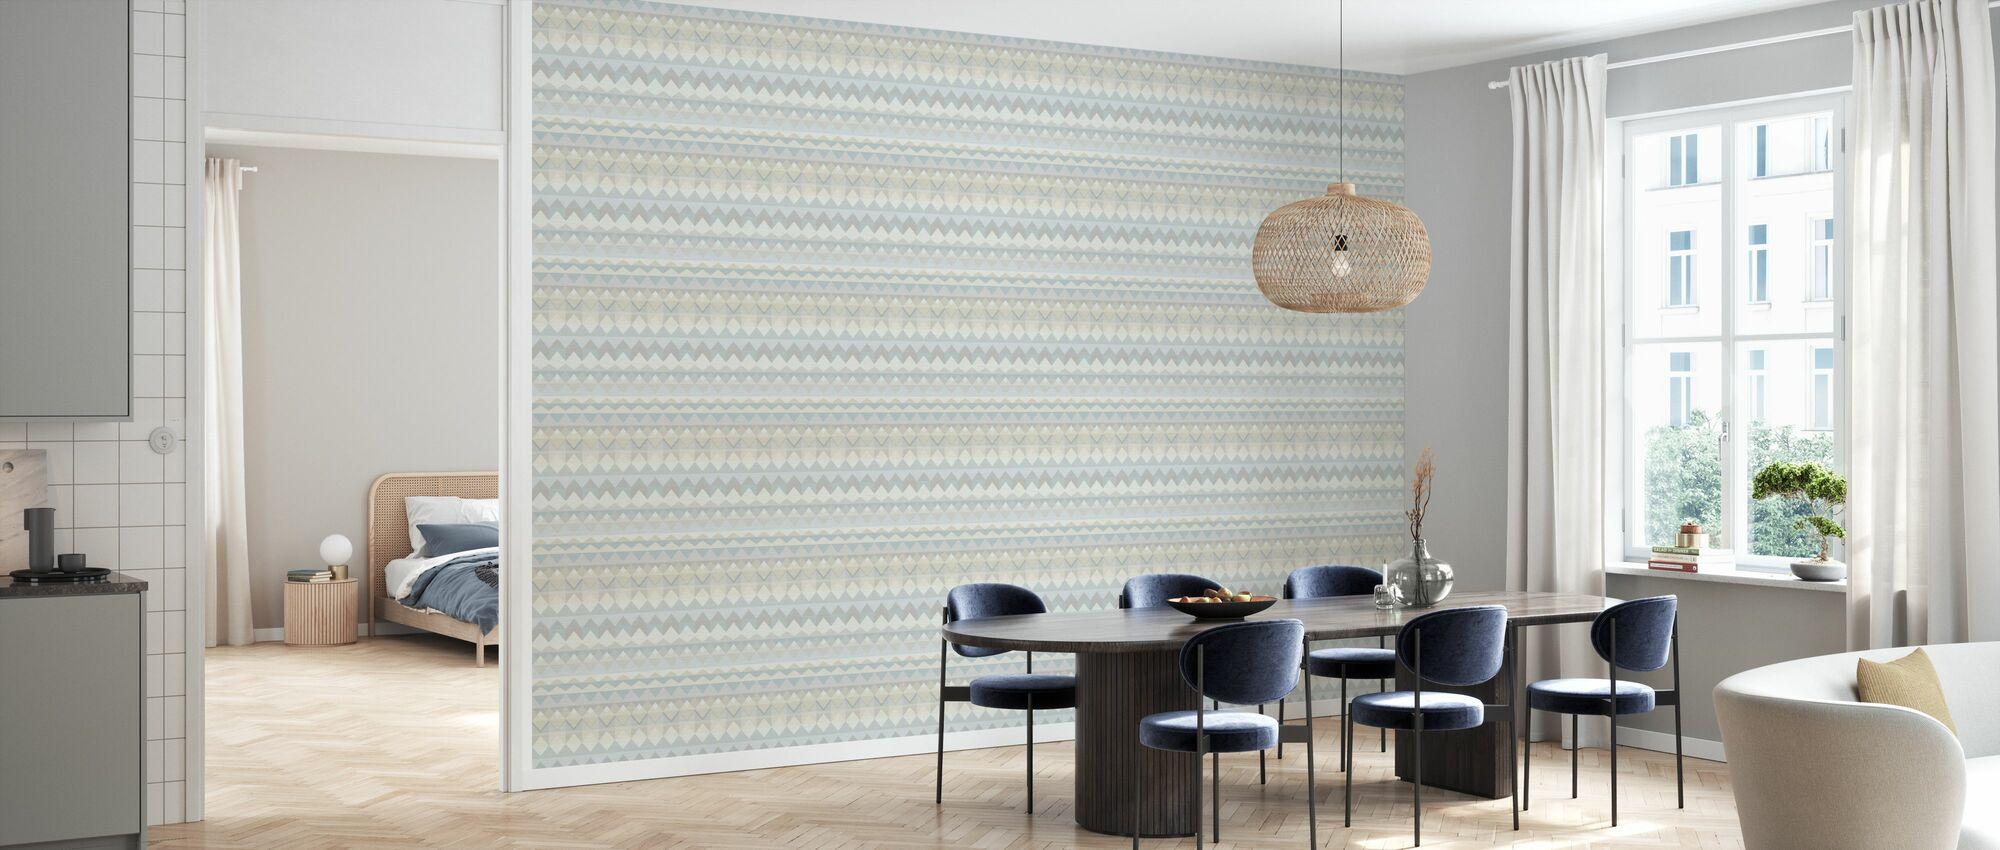 Weave Calm - Wallpaper - Kitchen